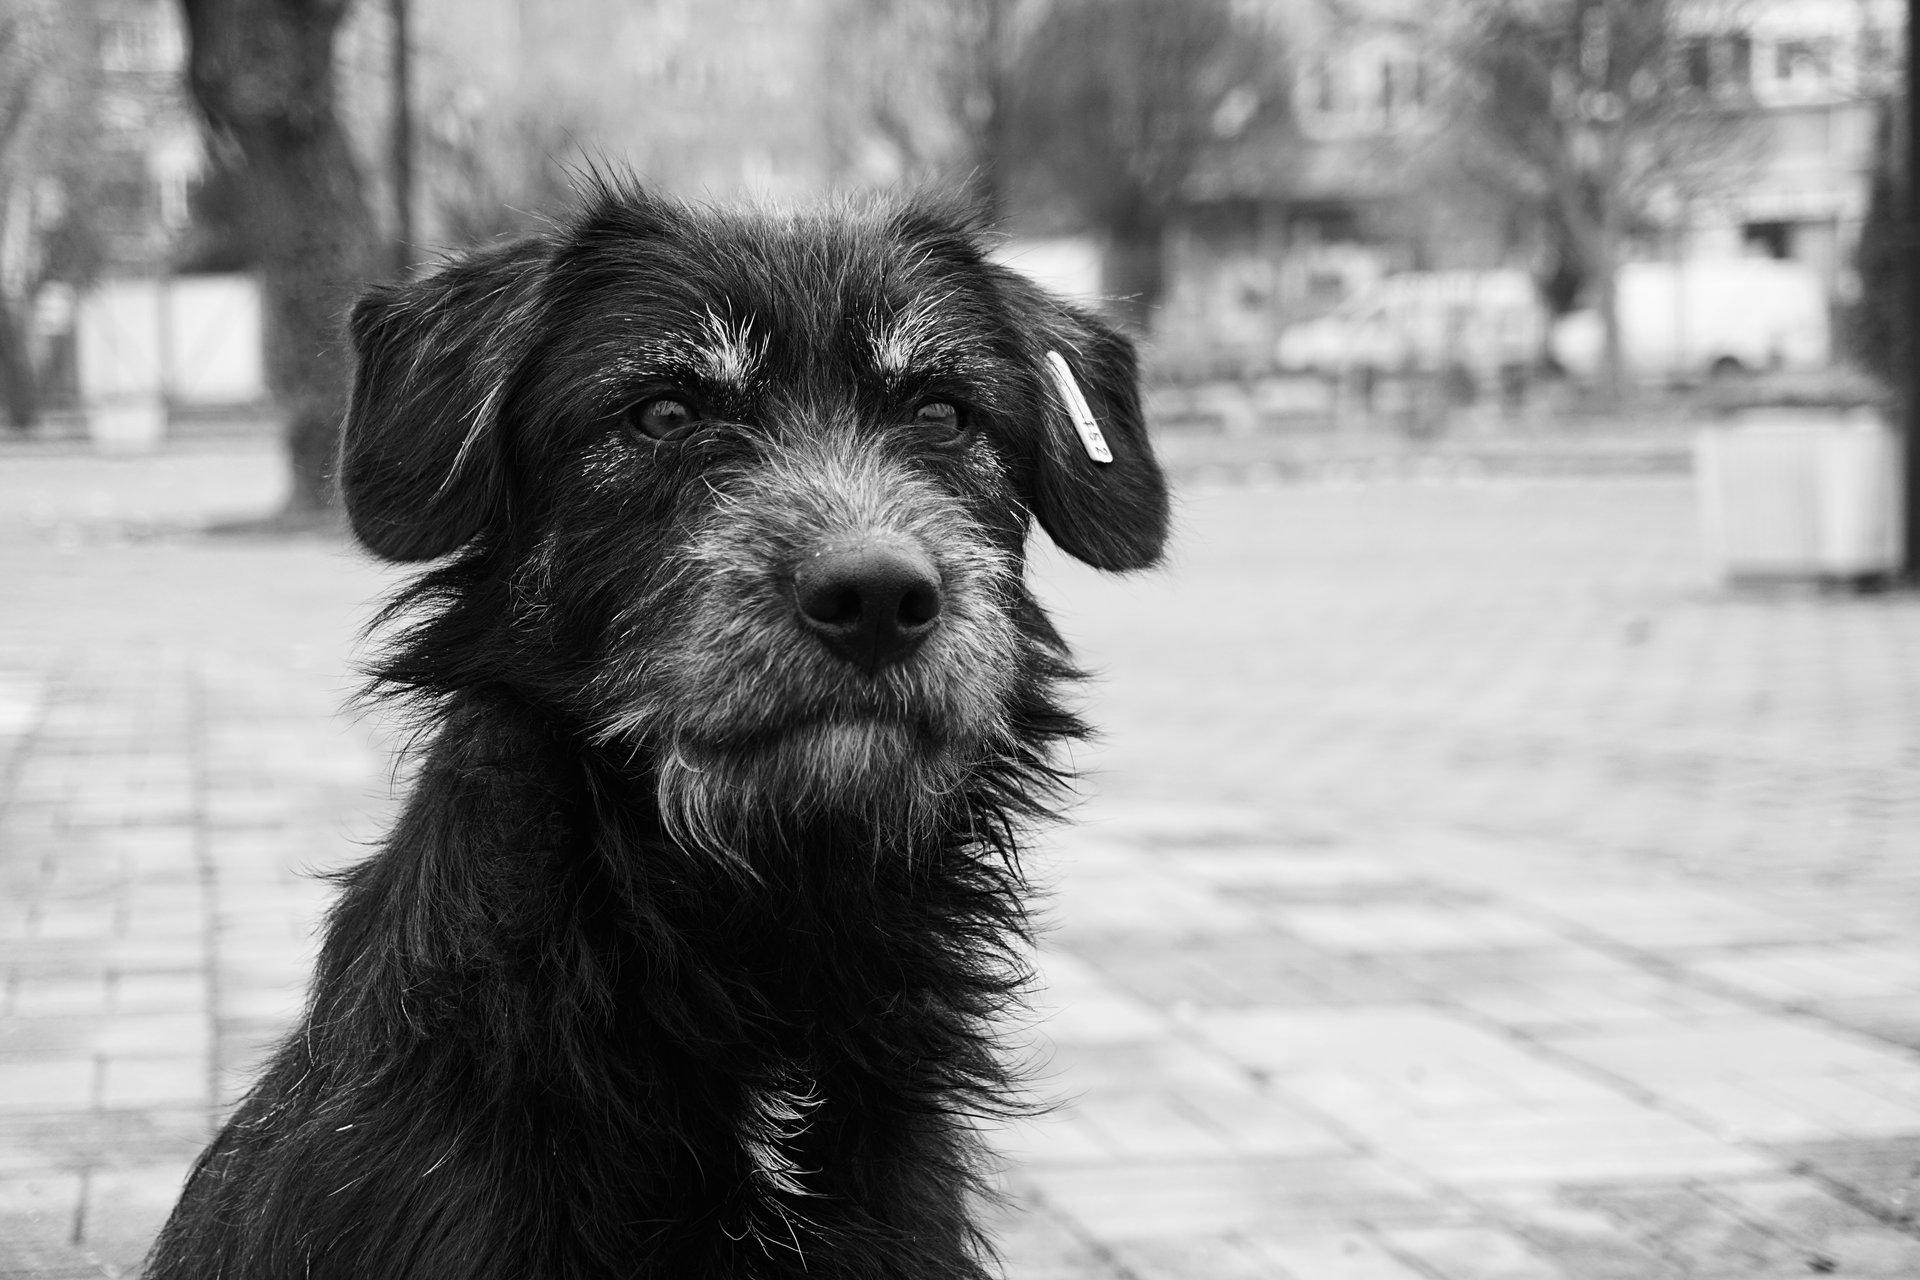 Очите говорят   Author Bozhidar  Genkov - CaptureTheMoment   PHOTO FORUM